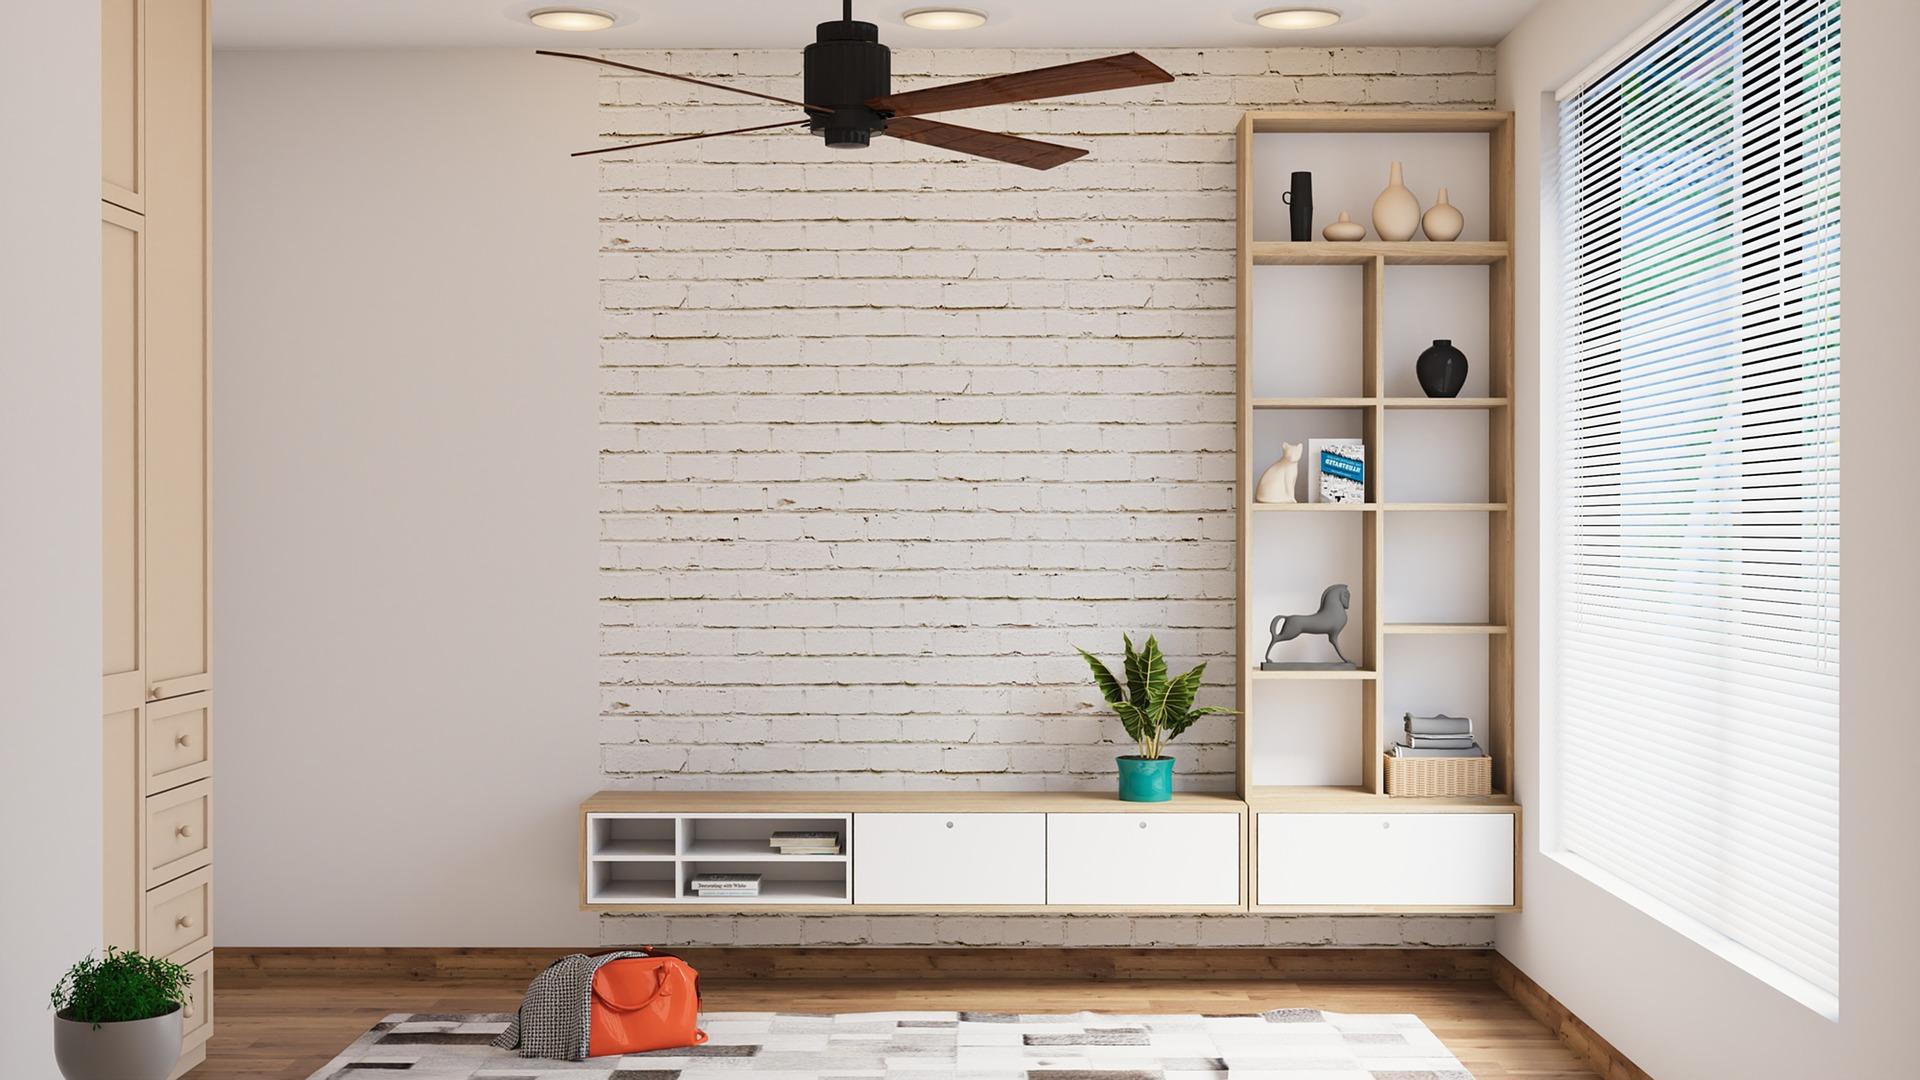 Ar-condicionado ou ventilador